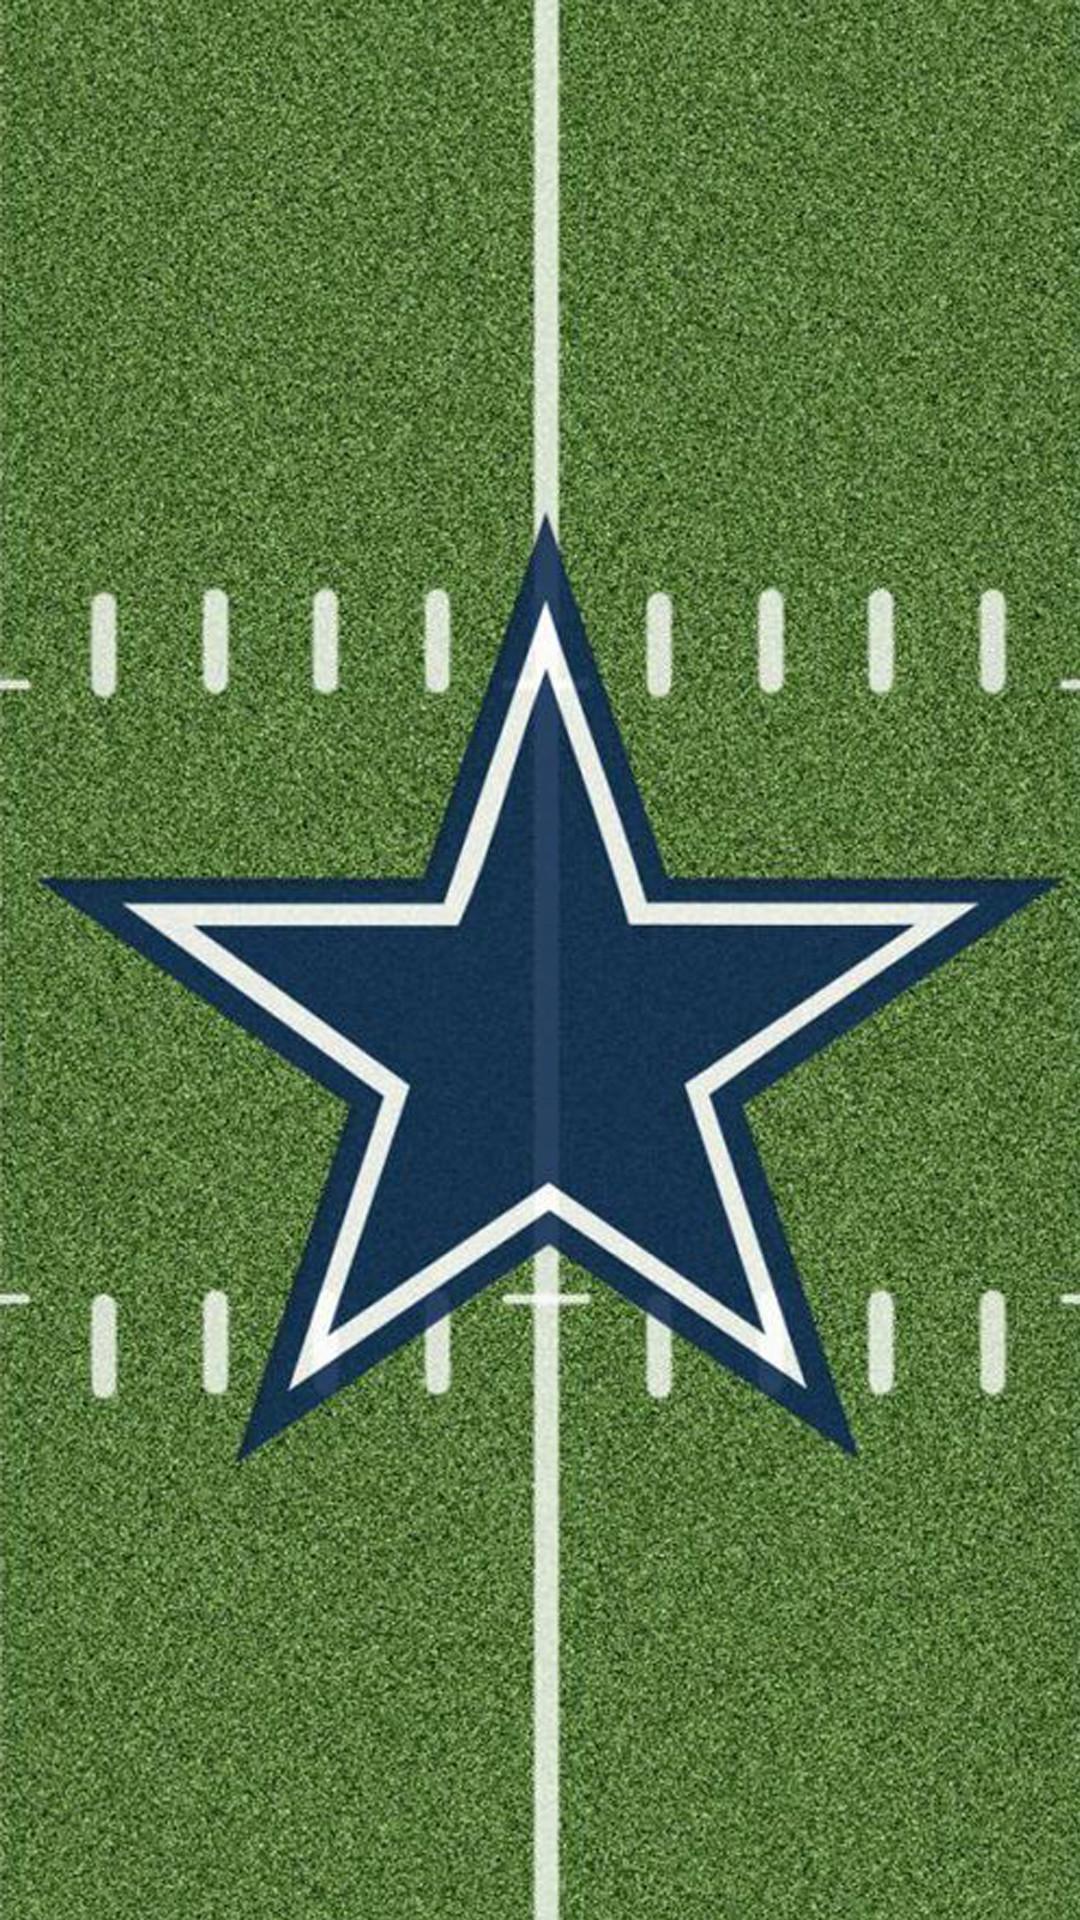 1920x1080 Cowboys Headlines - Dallas Cowboys Draft: Making A Case Against Ezekiel Elliott